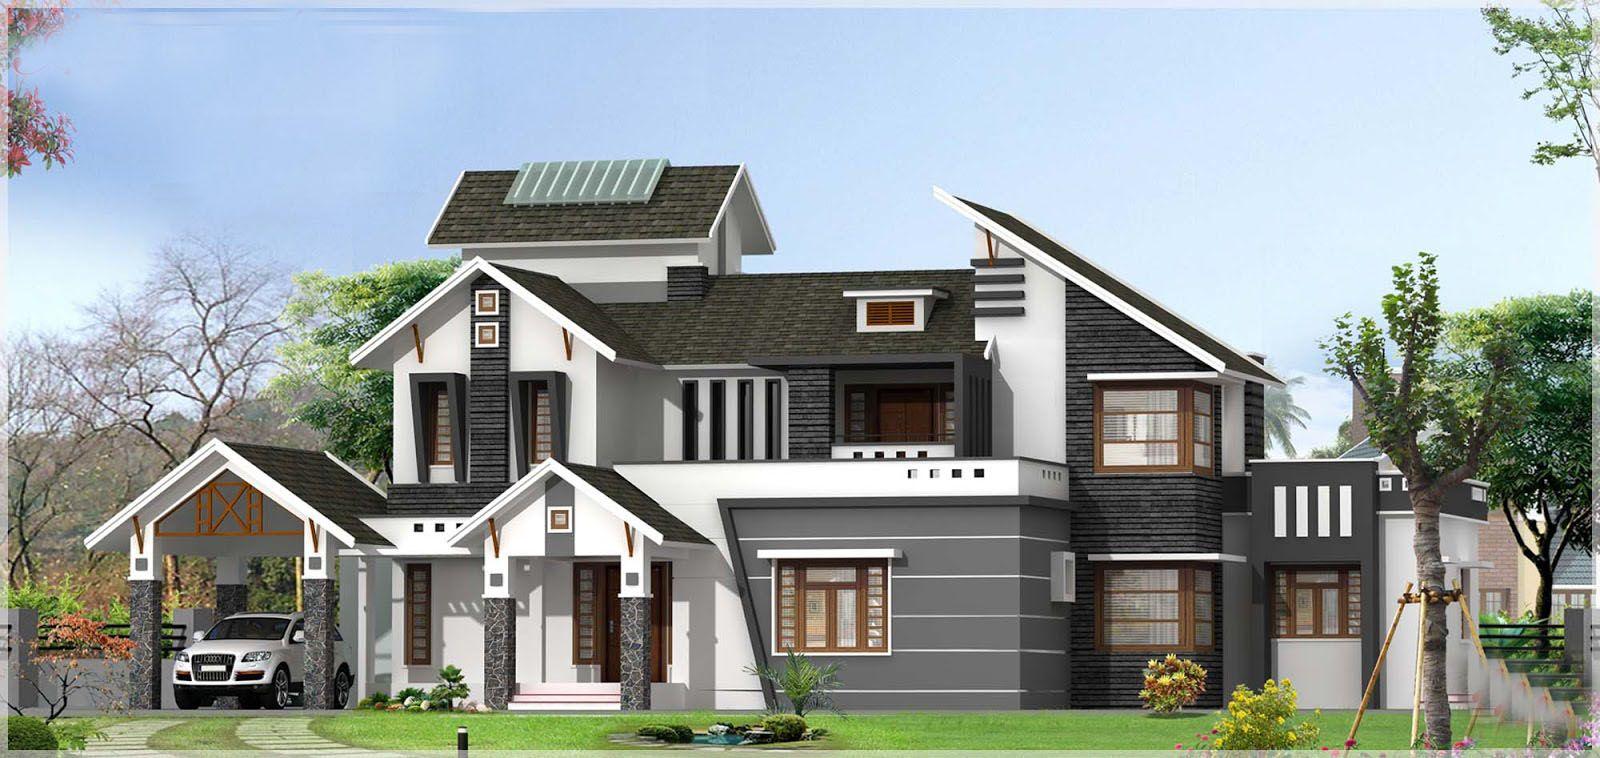 Sloping Roof Kerala house design at 3136 sqft with Pergolas